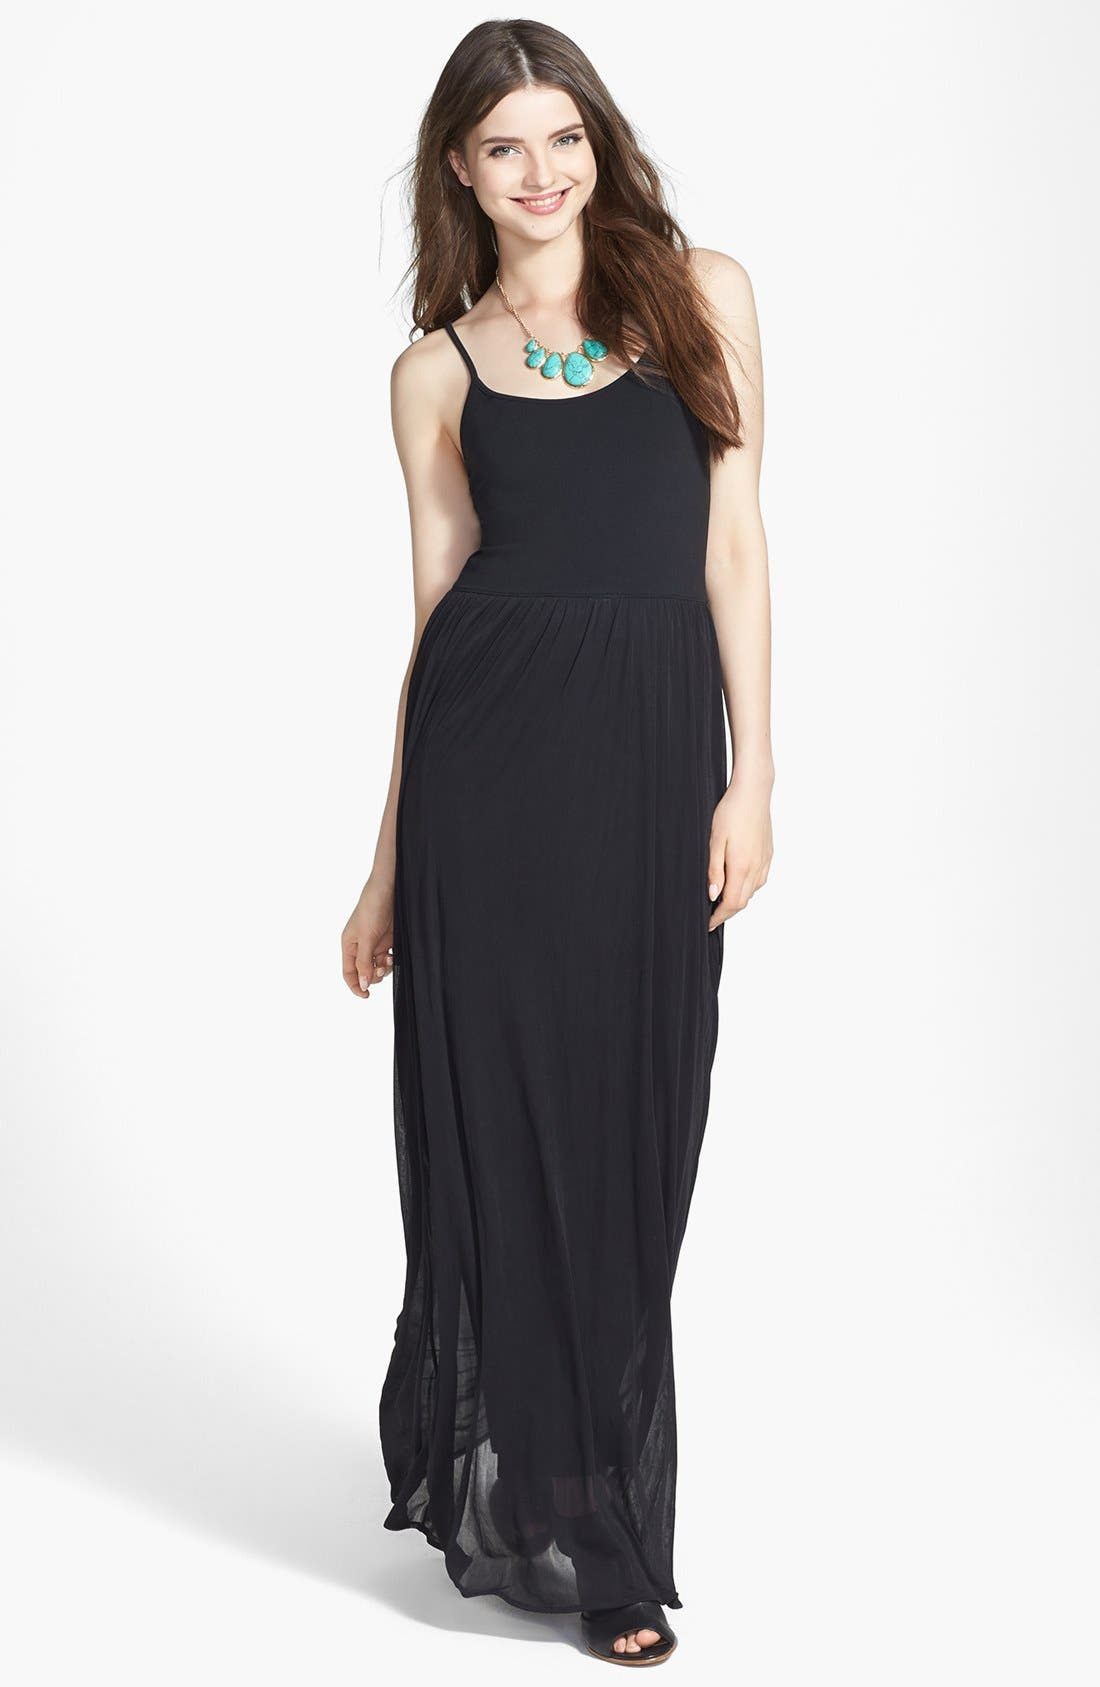 Alternate Image 1 Selected - Frenchi® V-Strap Maxi Dress (Juniors)